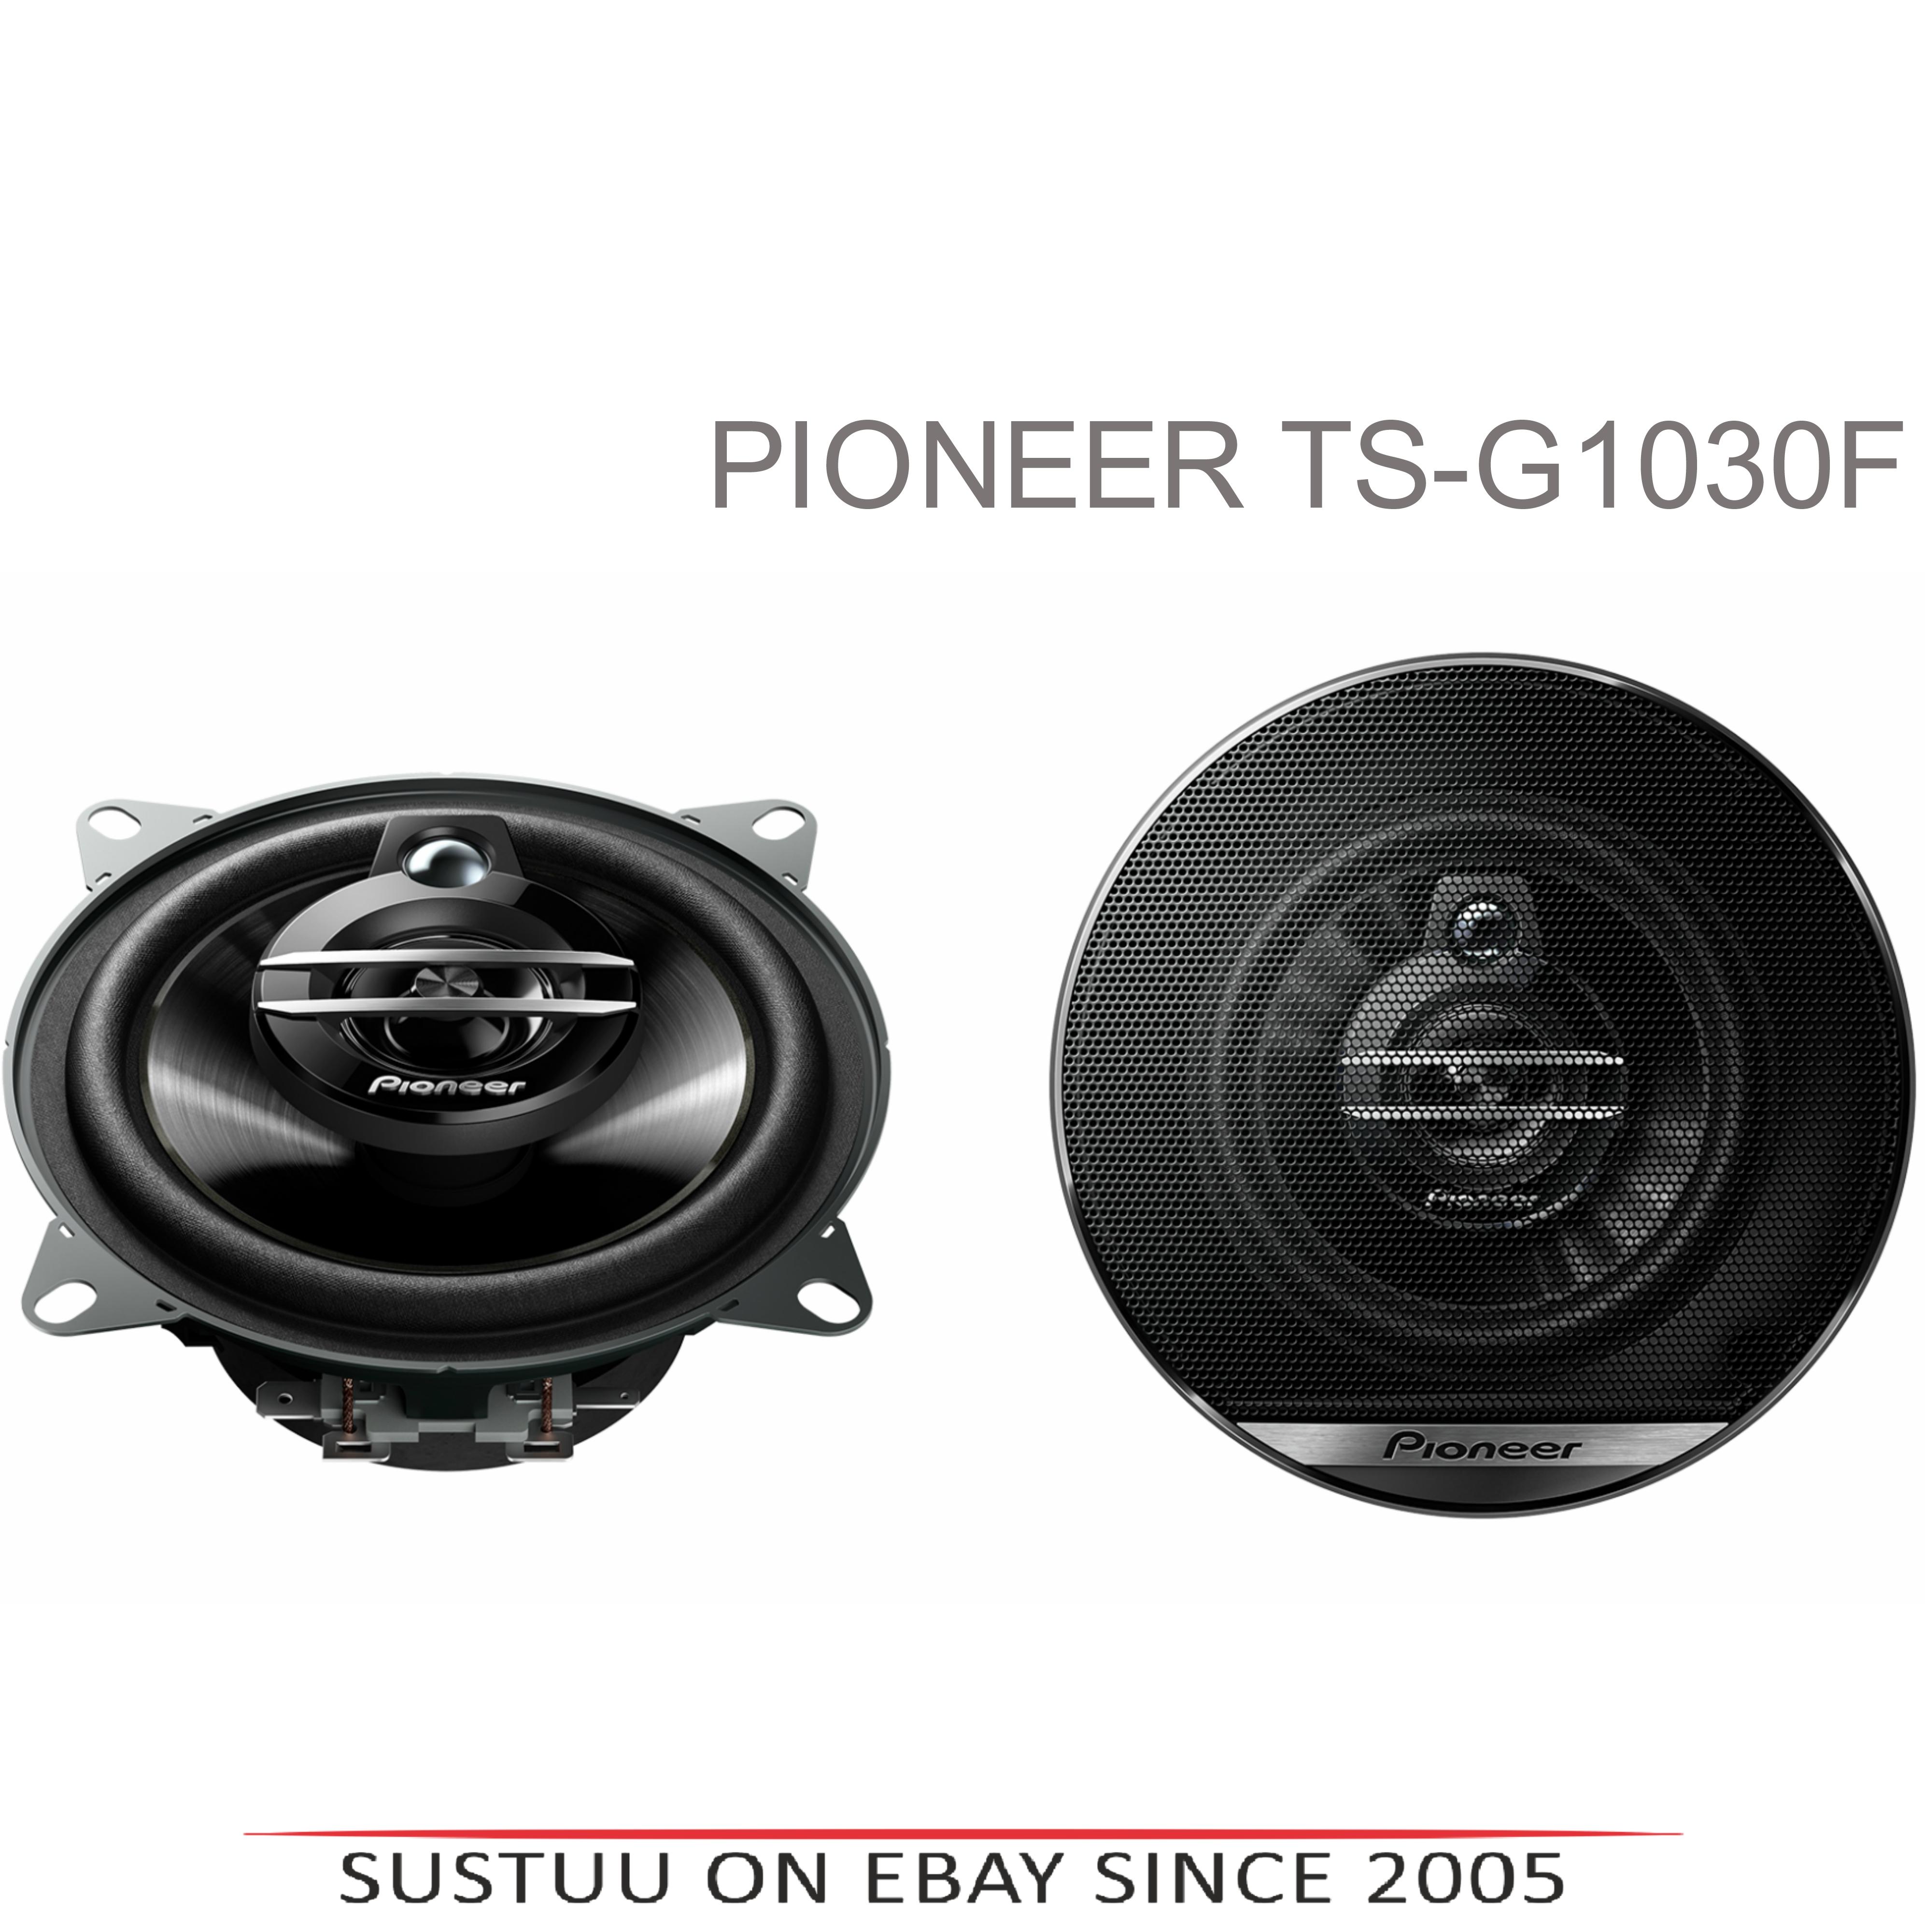 Pioneer TS G1030F|In Car 3-way Coaxial Speakers|G Series|Door-Shelf|10cm|30-210W